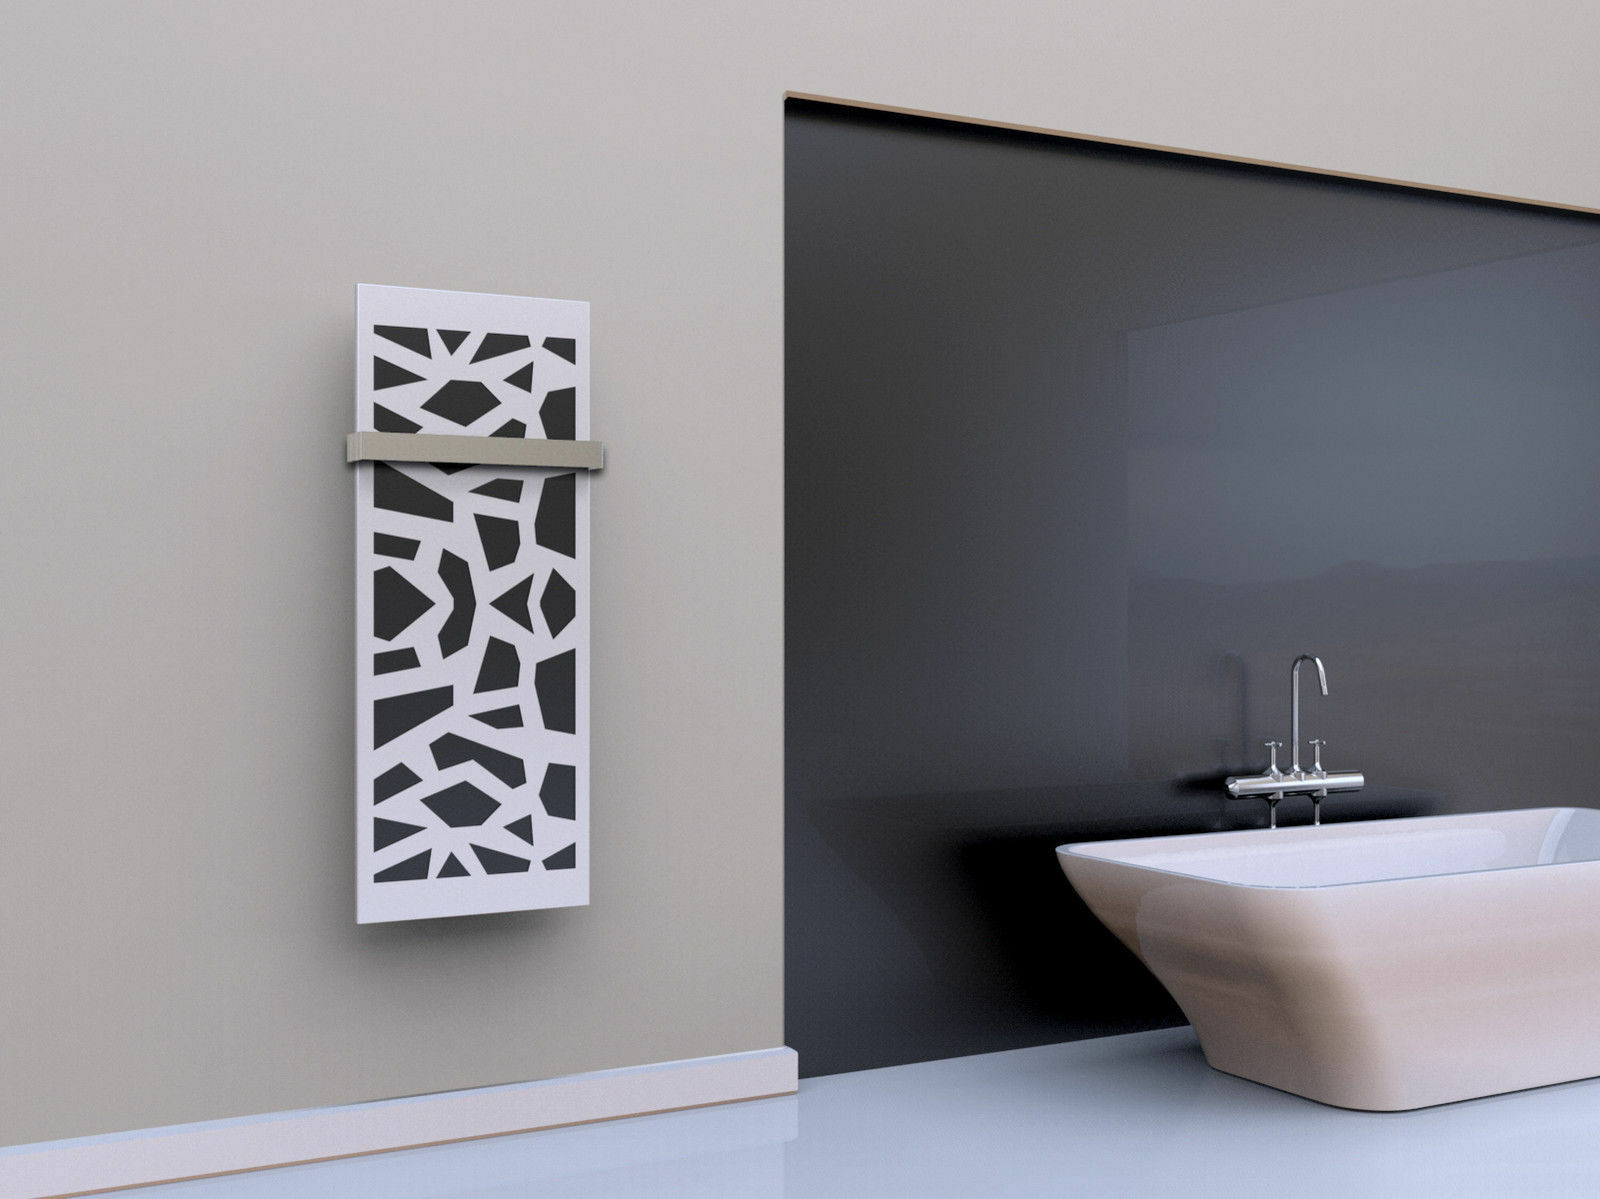 Badheizkörper Design Mosaik Mosaik Mosaik 2: 120x47 cm, silber/weiß + Handtuchhalter breit 08de59